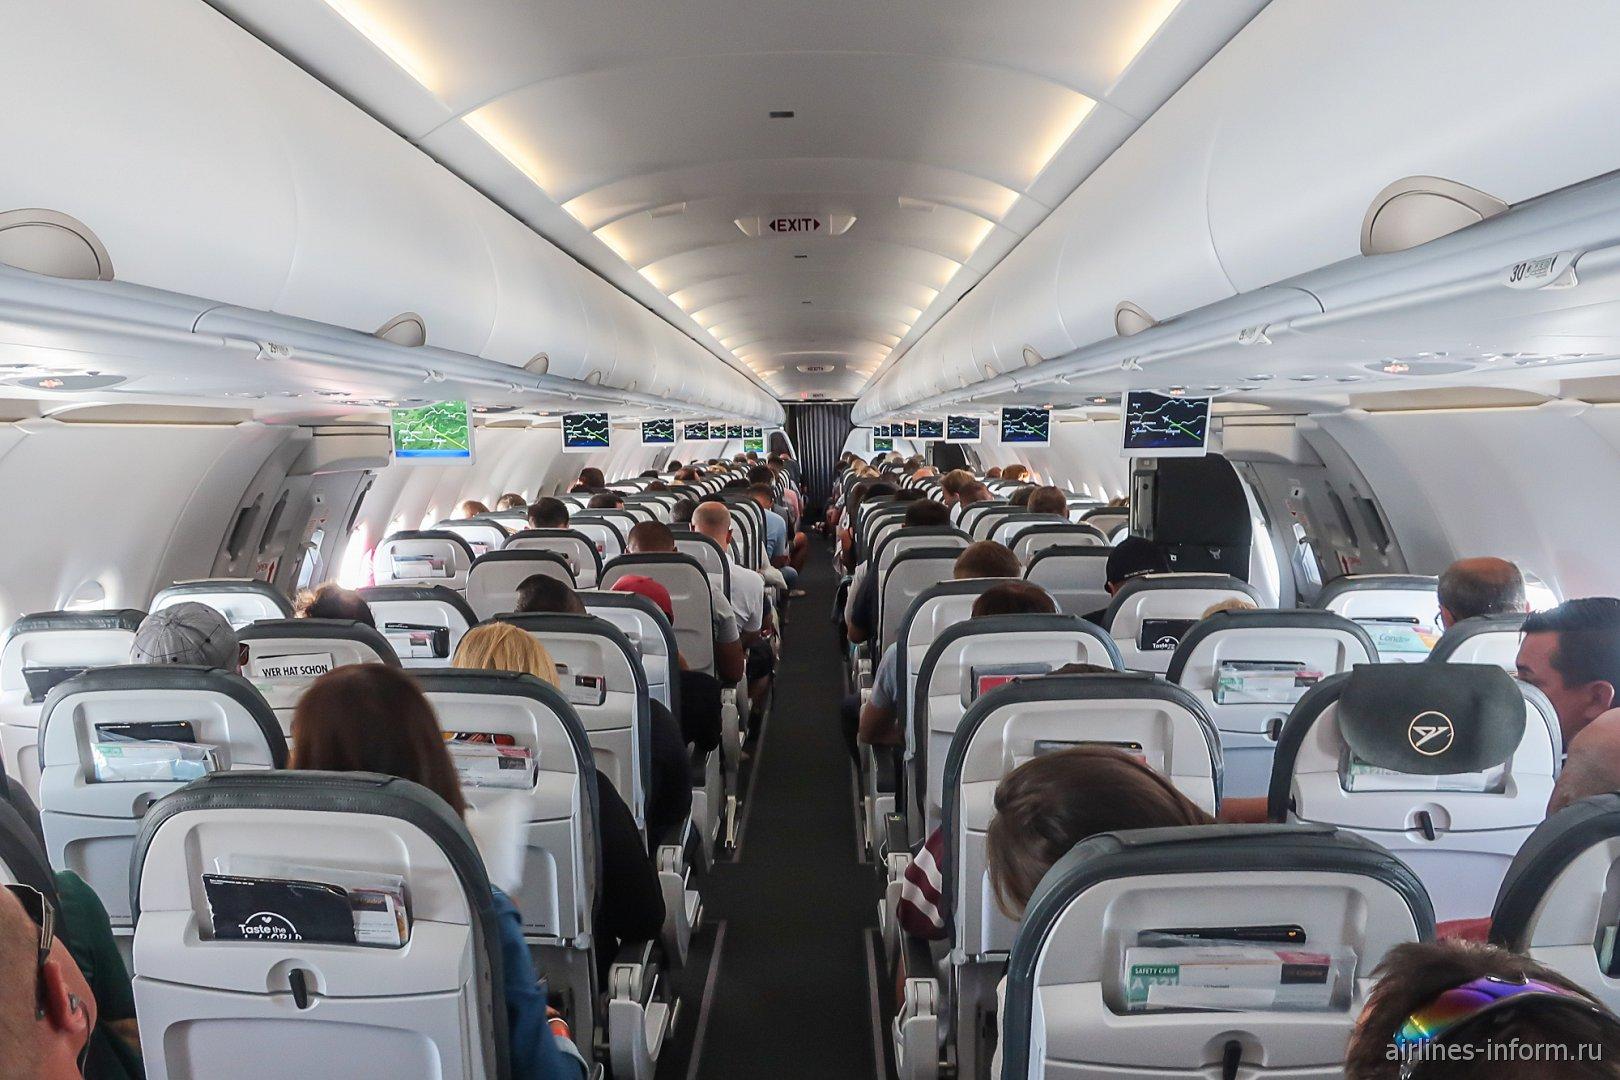 Пассажирский салон самолета Airbus A321 авиакомпании Condor